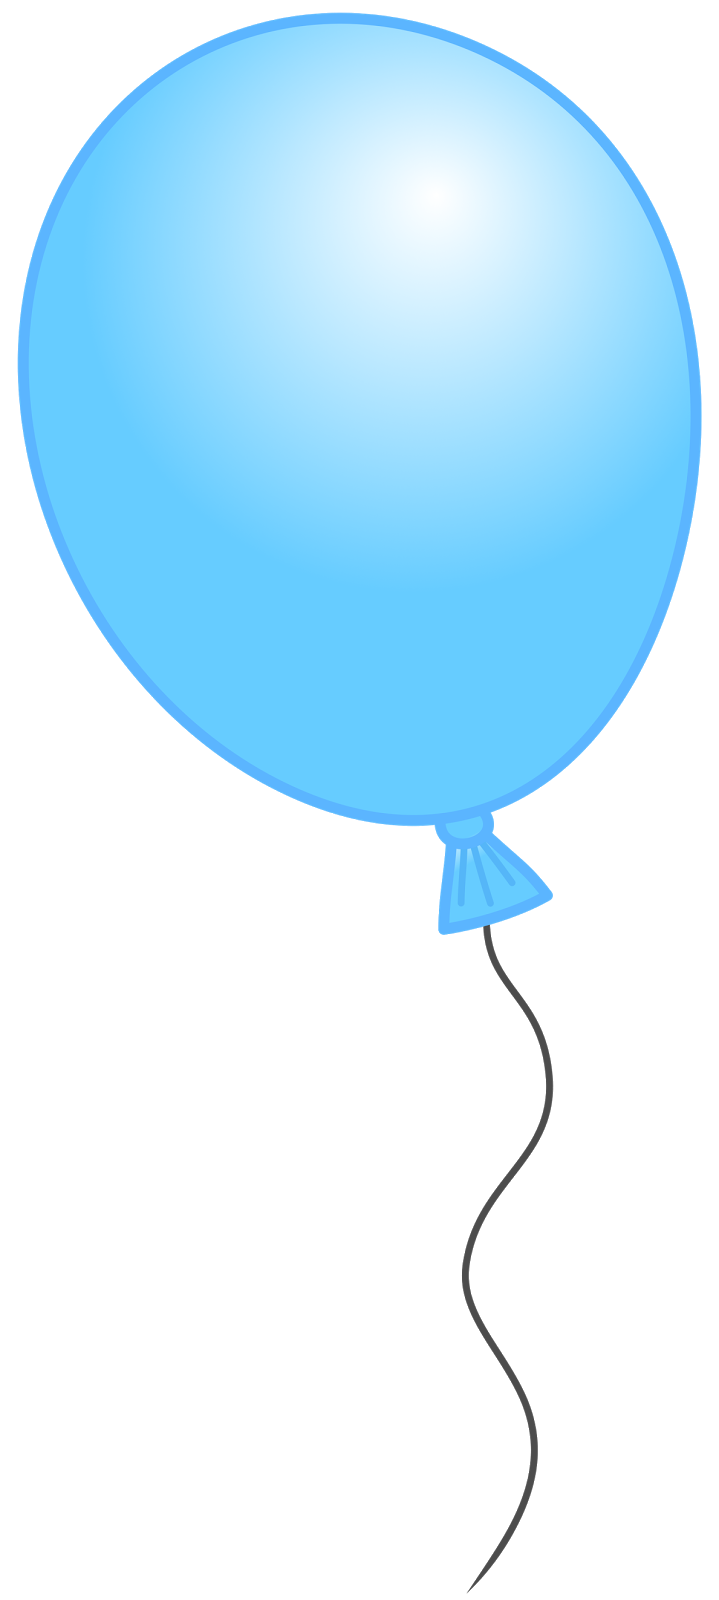 Single Birthday Balloons Clipart.